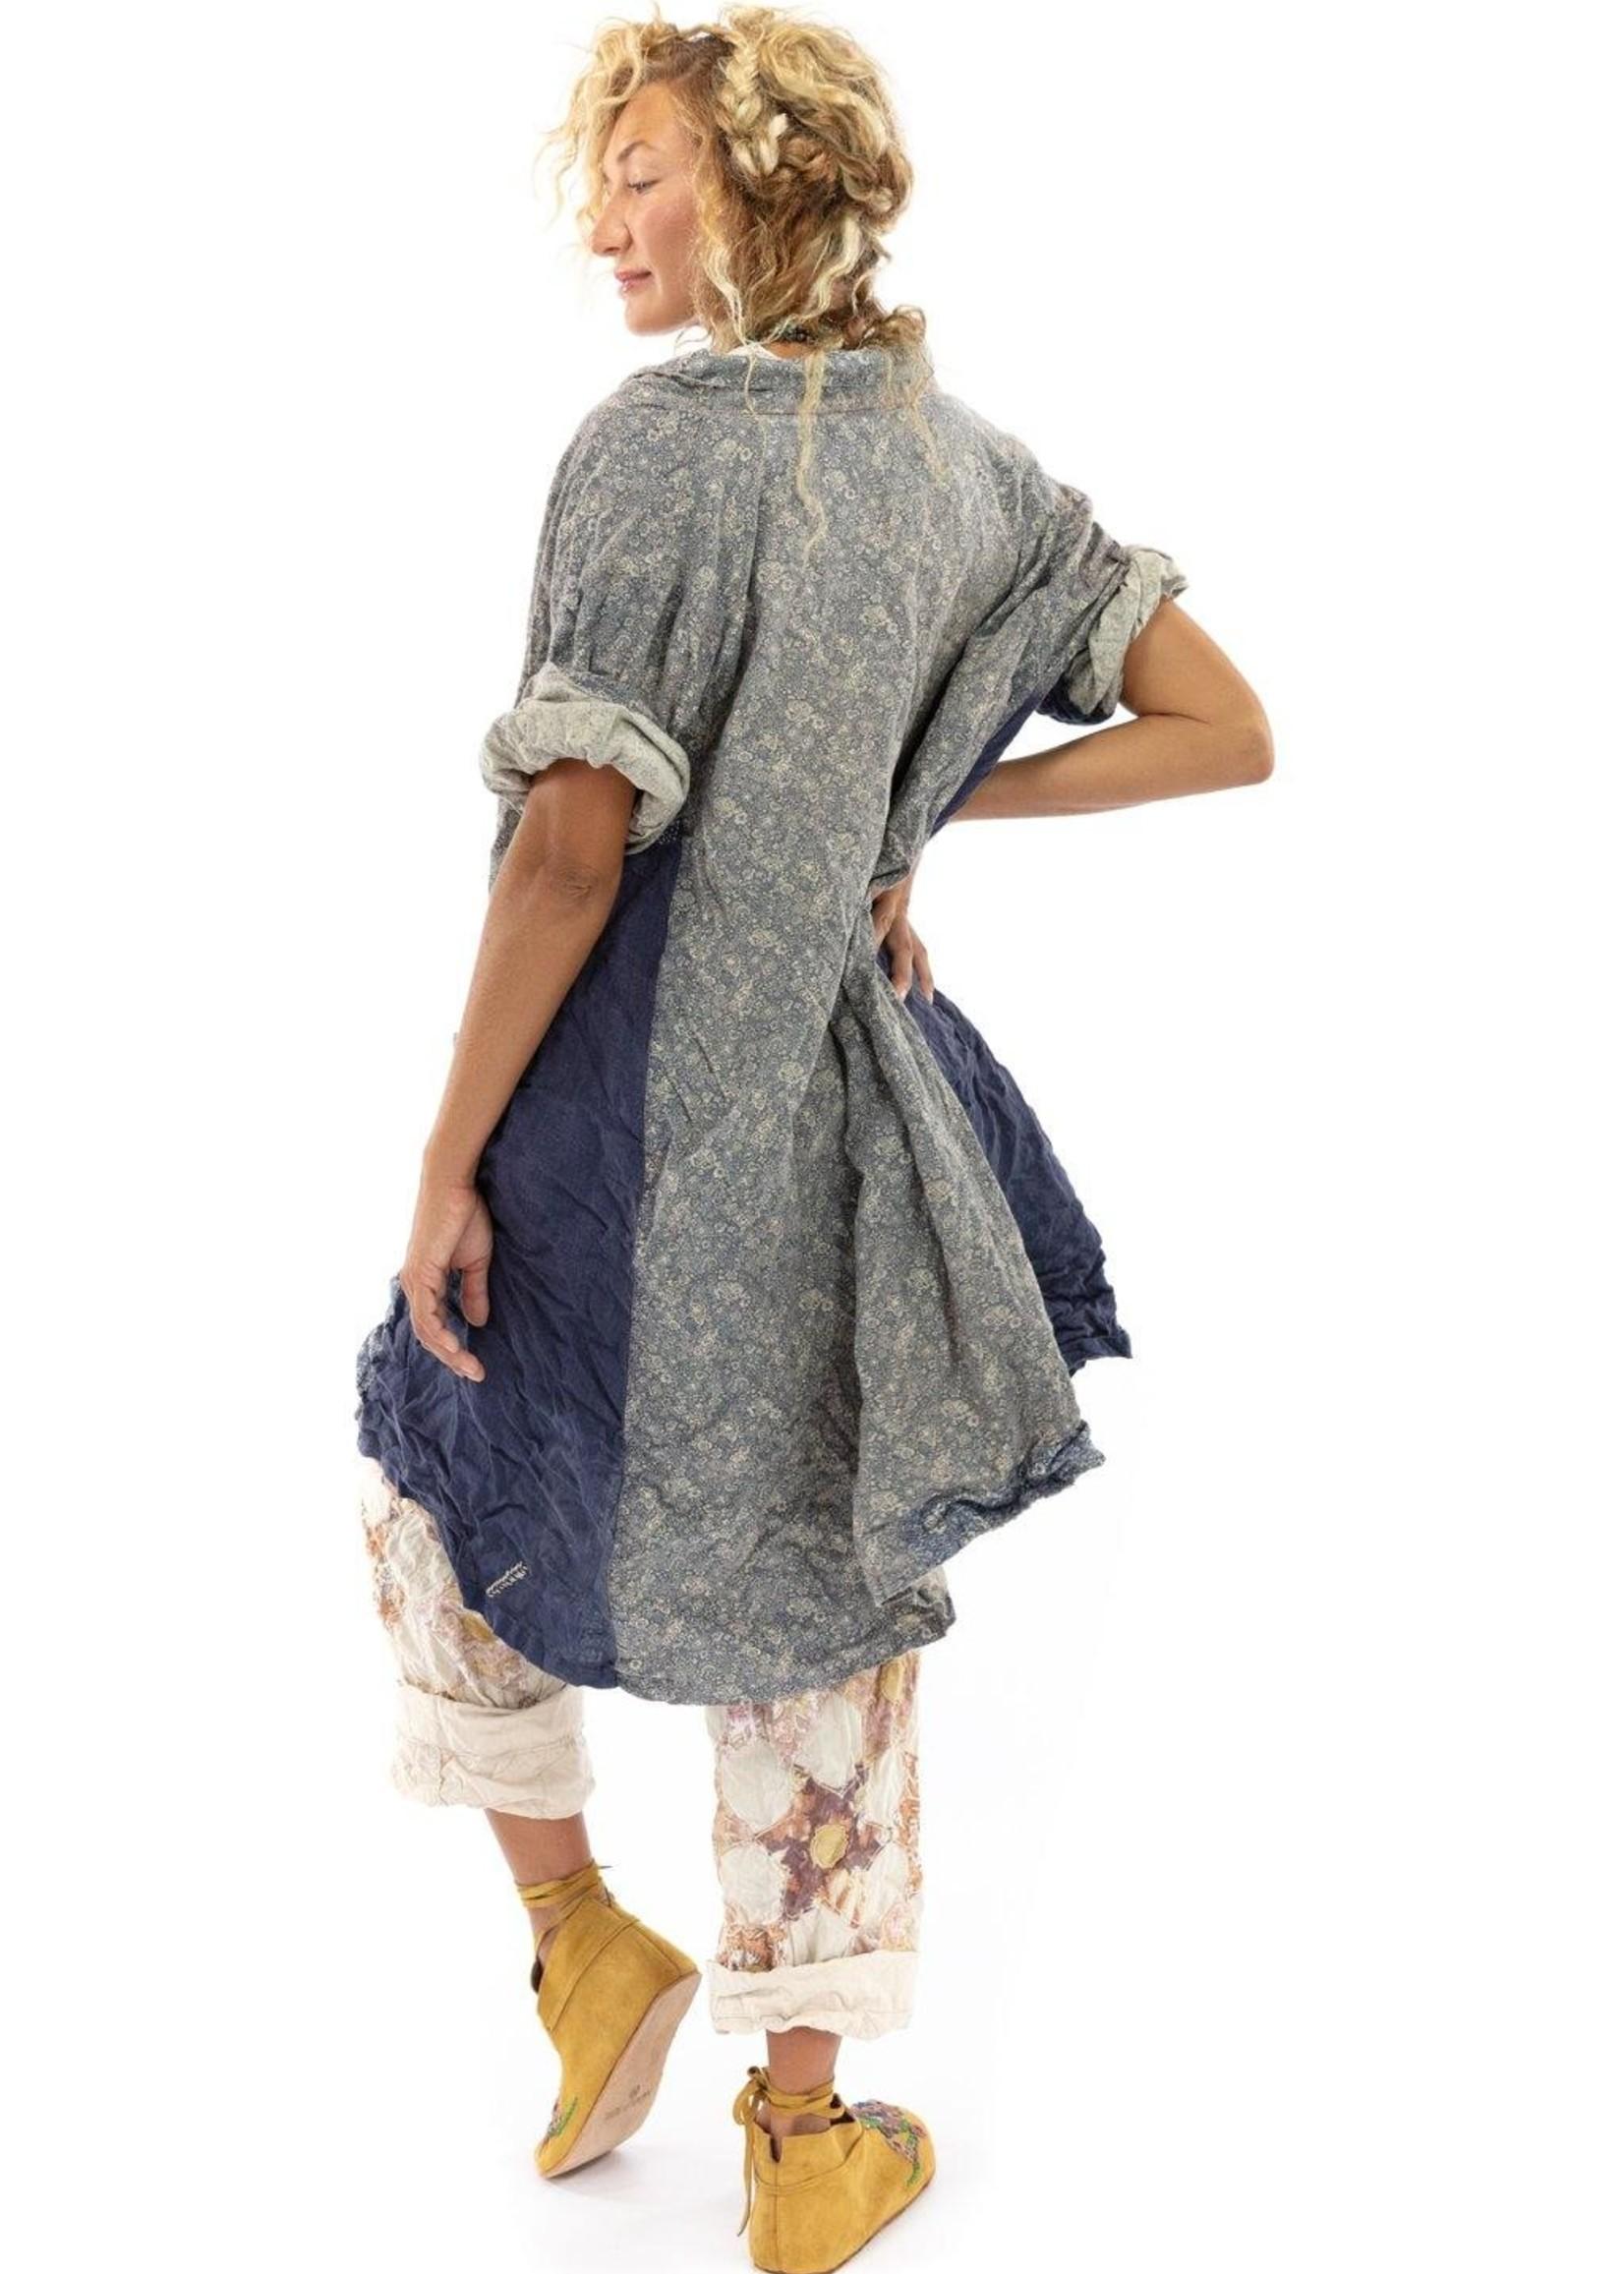 Magnolia Pearl Johanna Smock Dress - Foothill